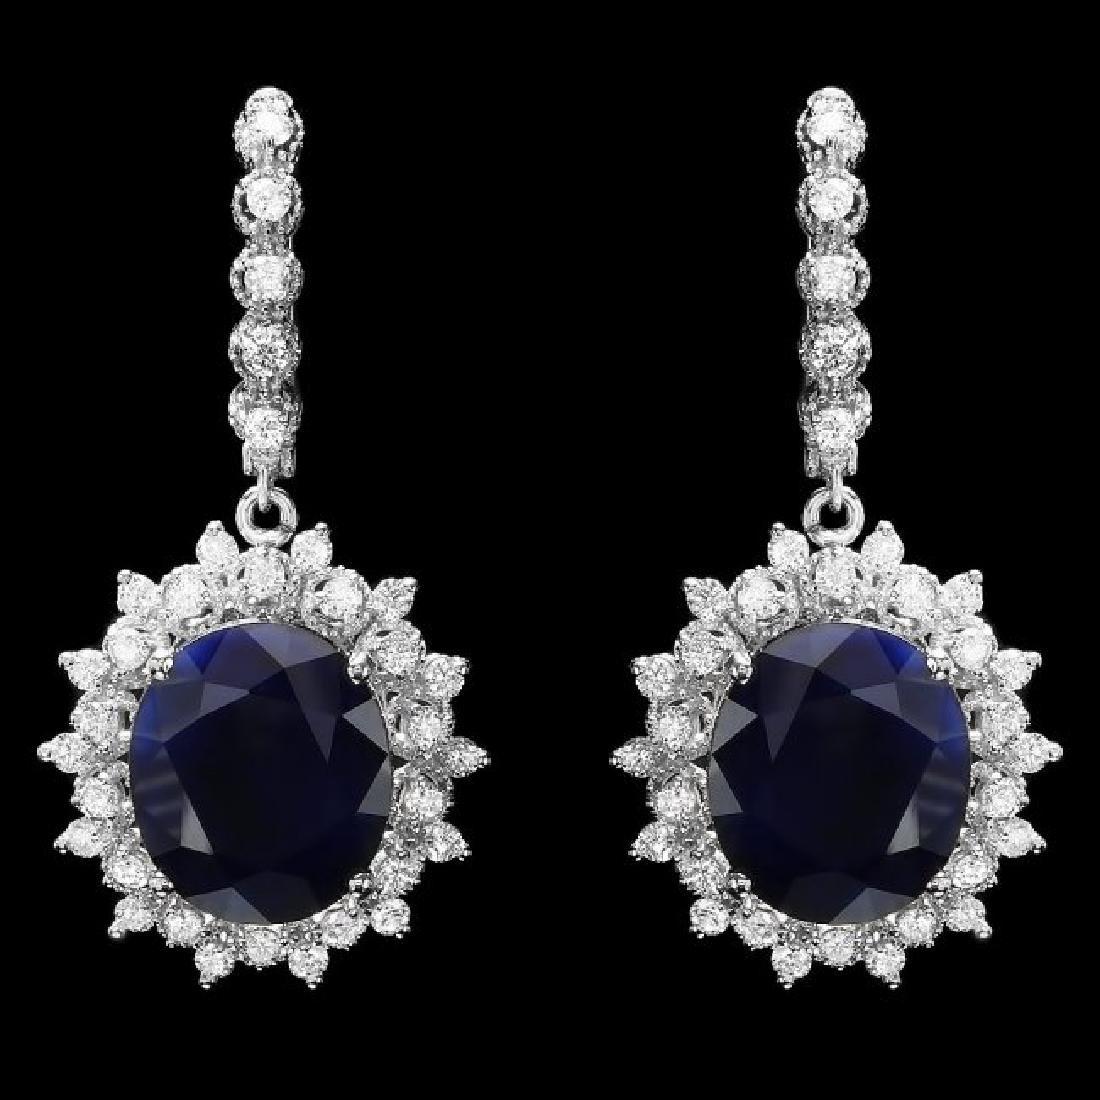 14k Gold 17ct Sapphire 1.80ct Diamond Earrings